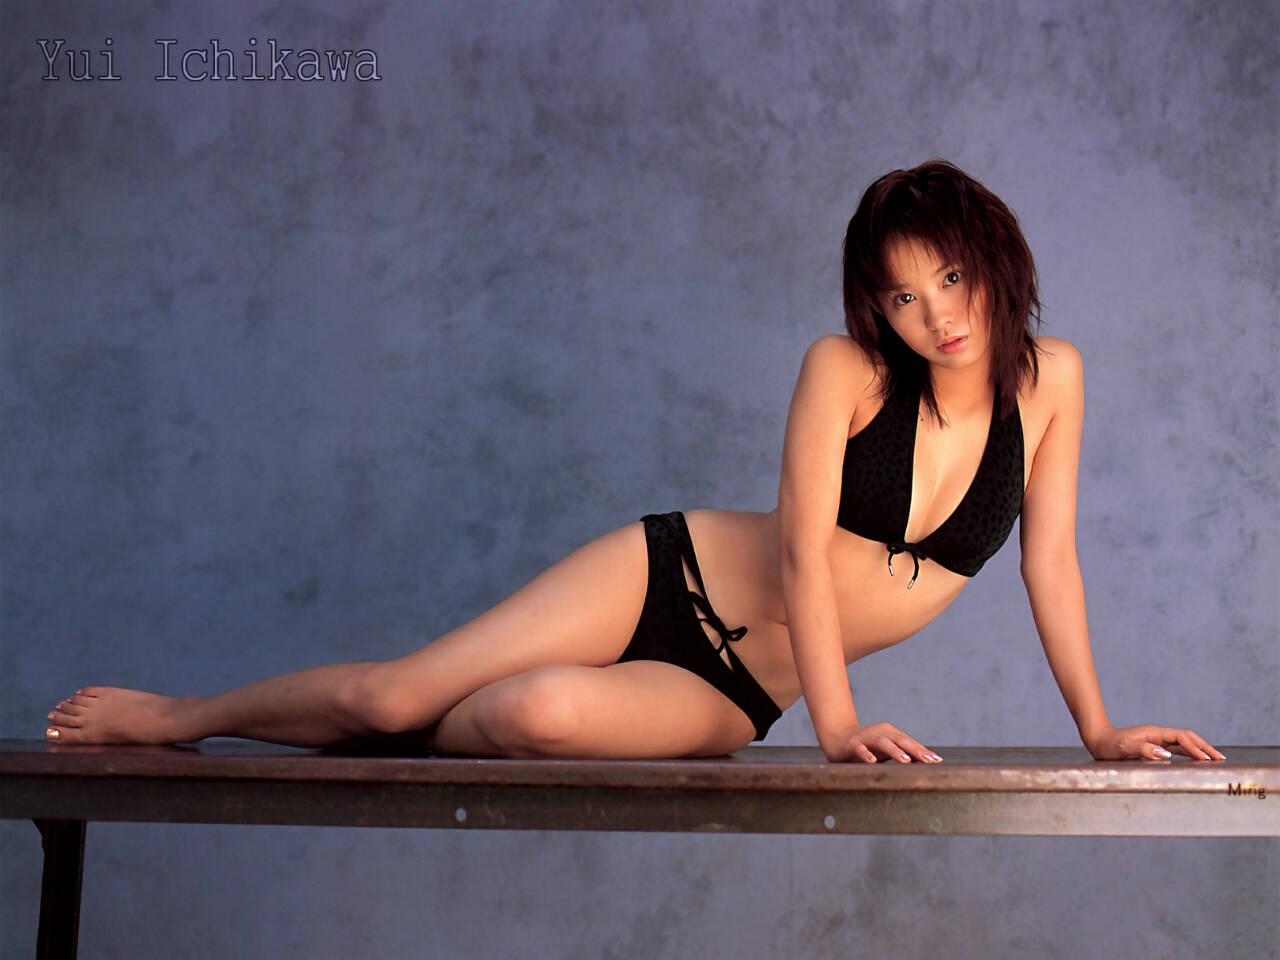 Volevo japan sexy free gallery